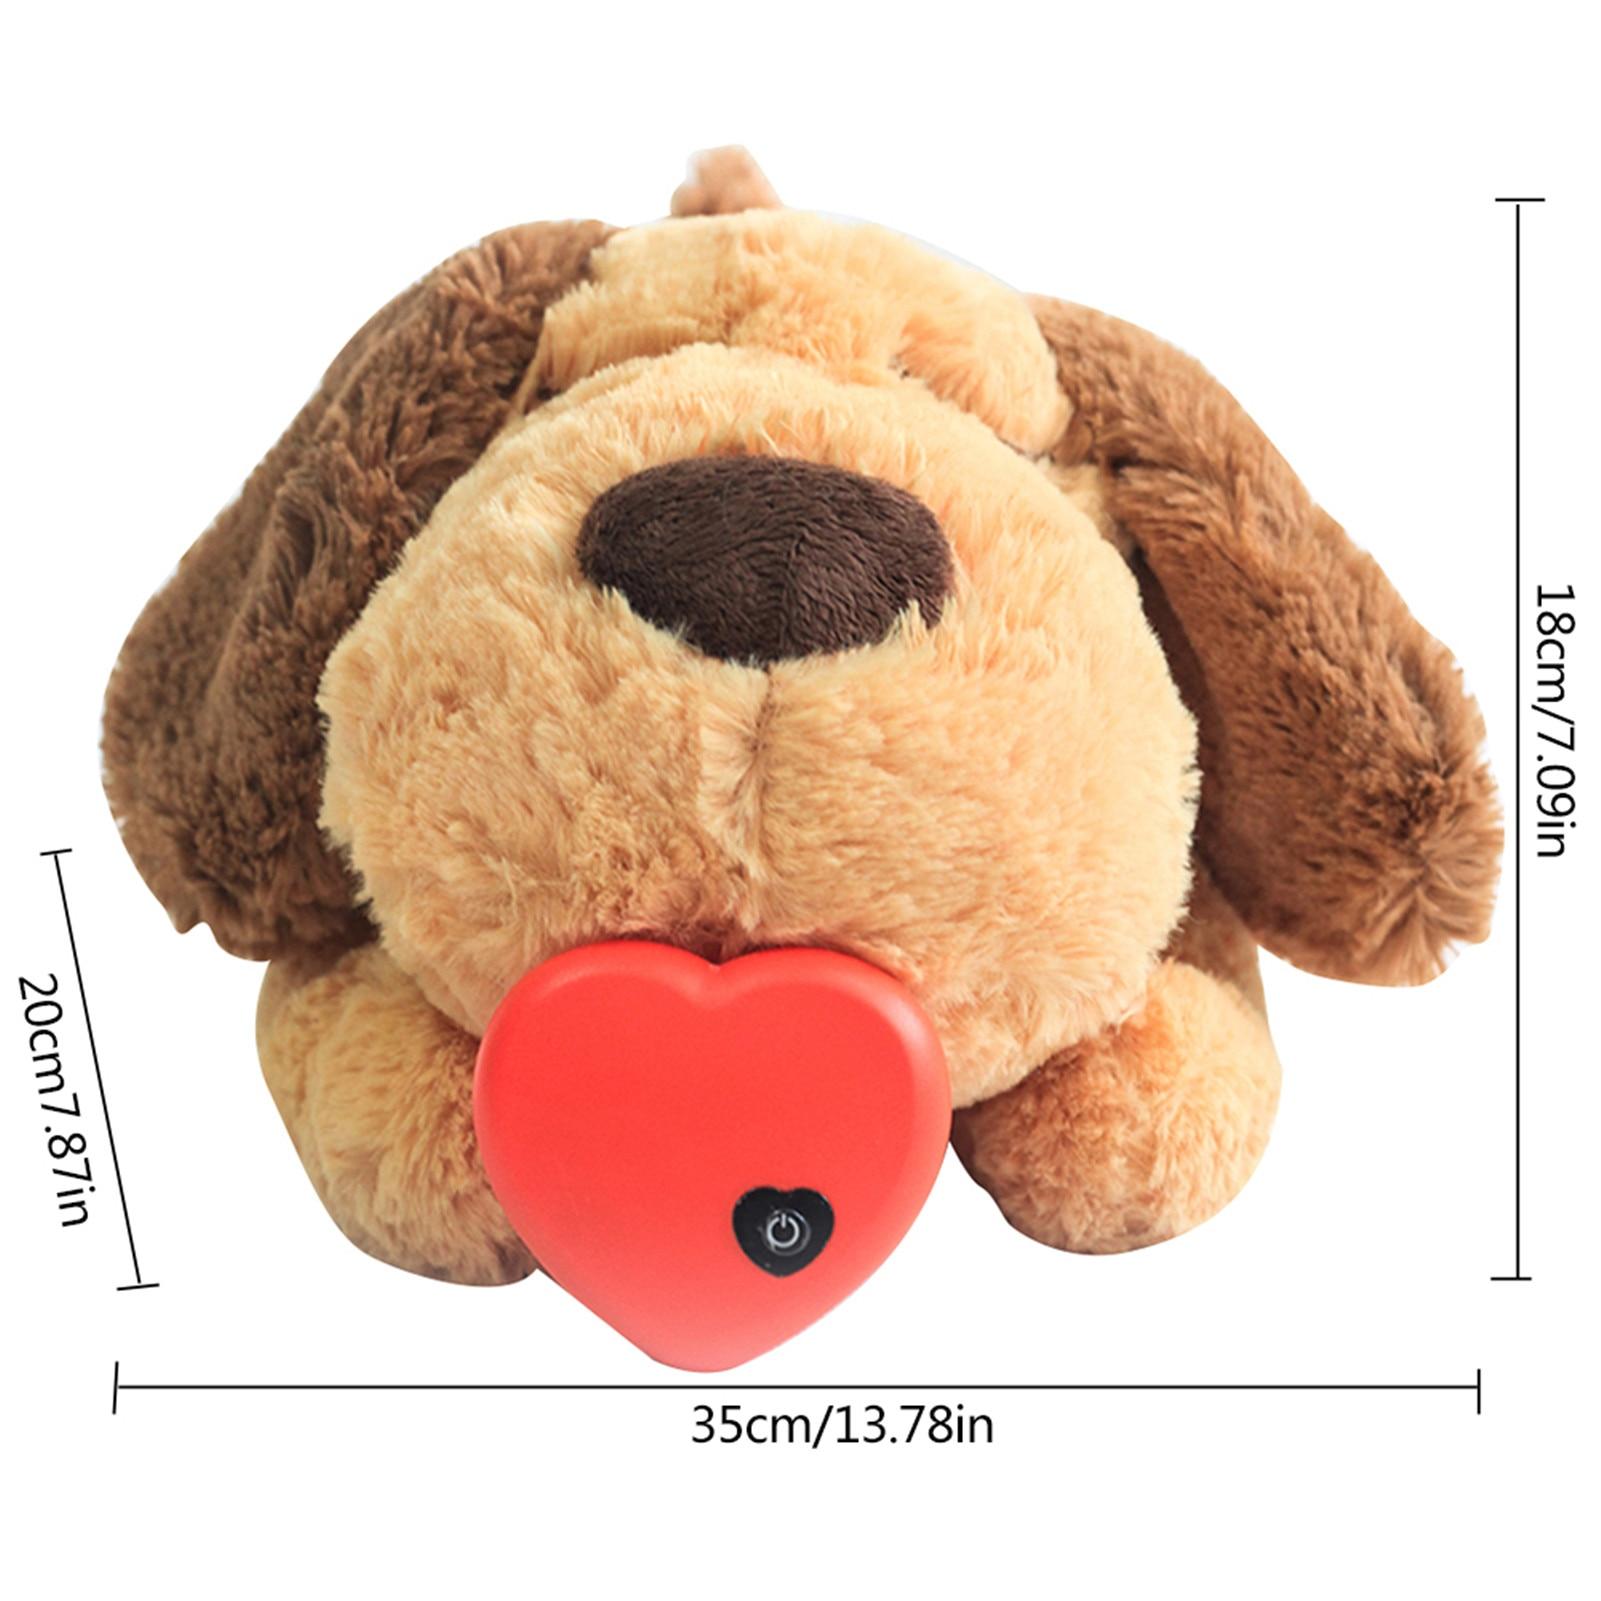 heartbeat toy